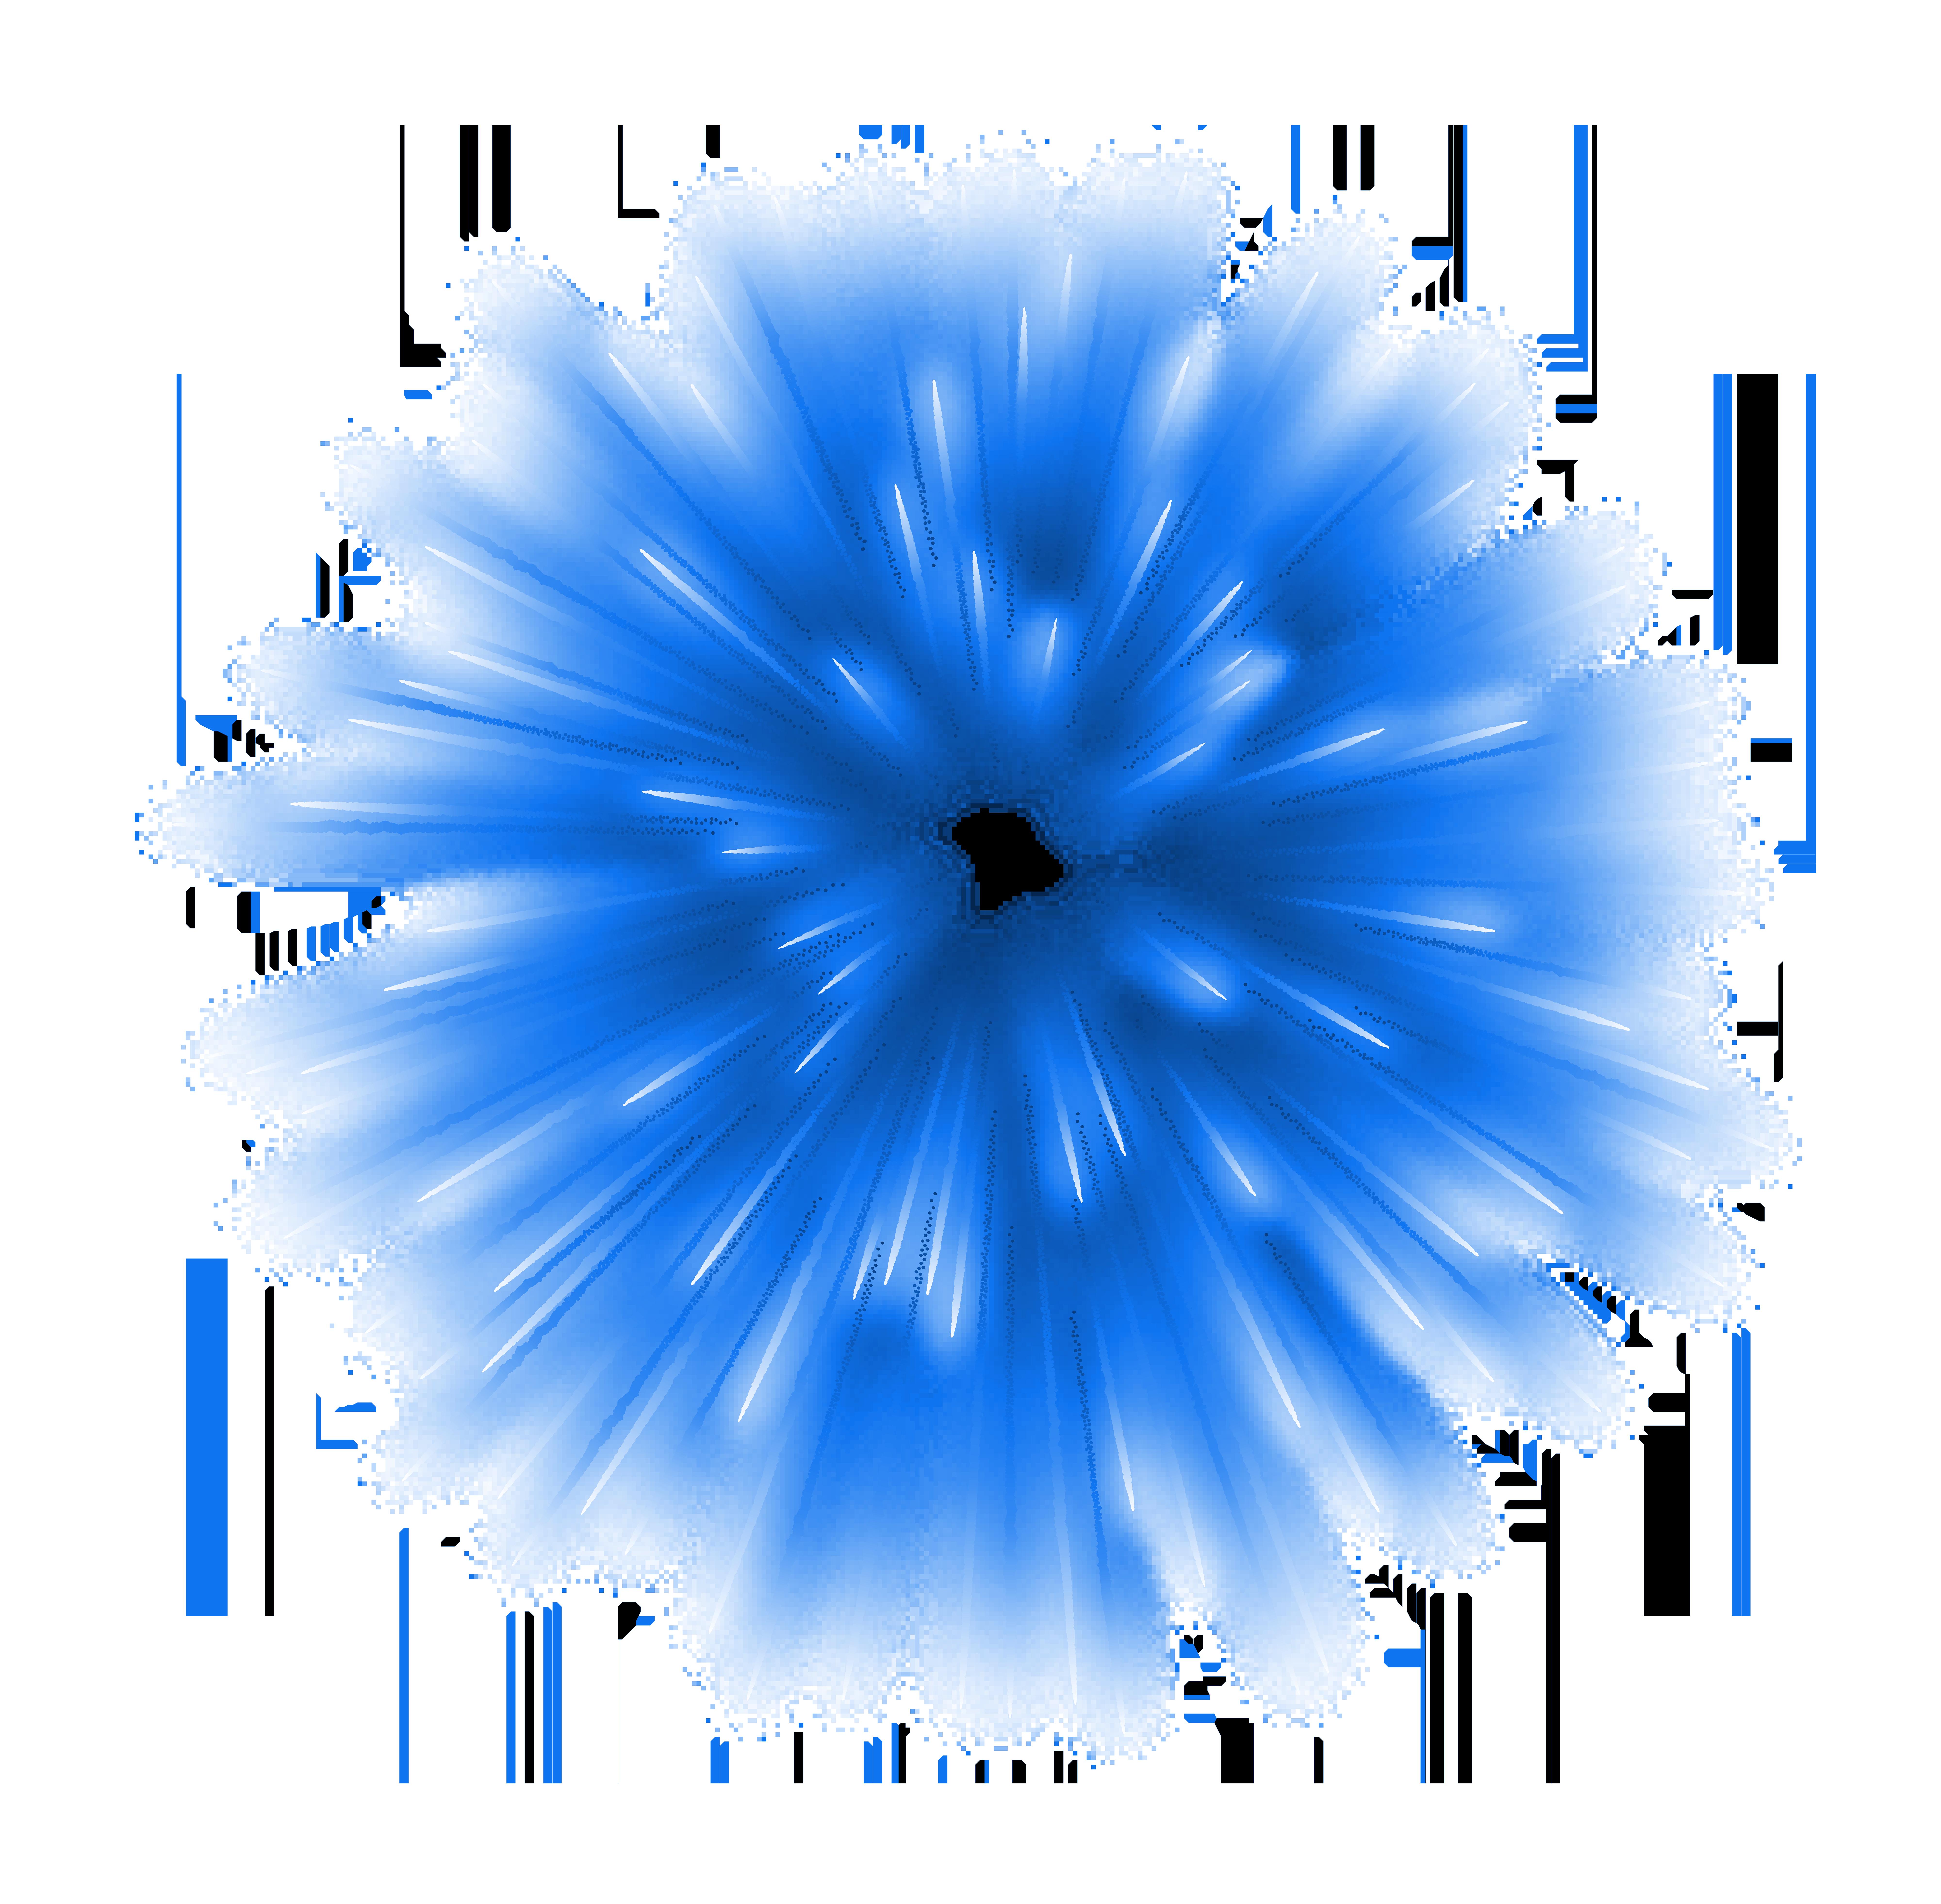 Clipart fireworks clip art. Firework blue transparent image